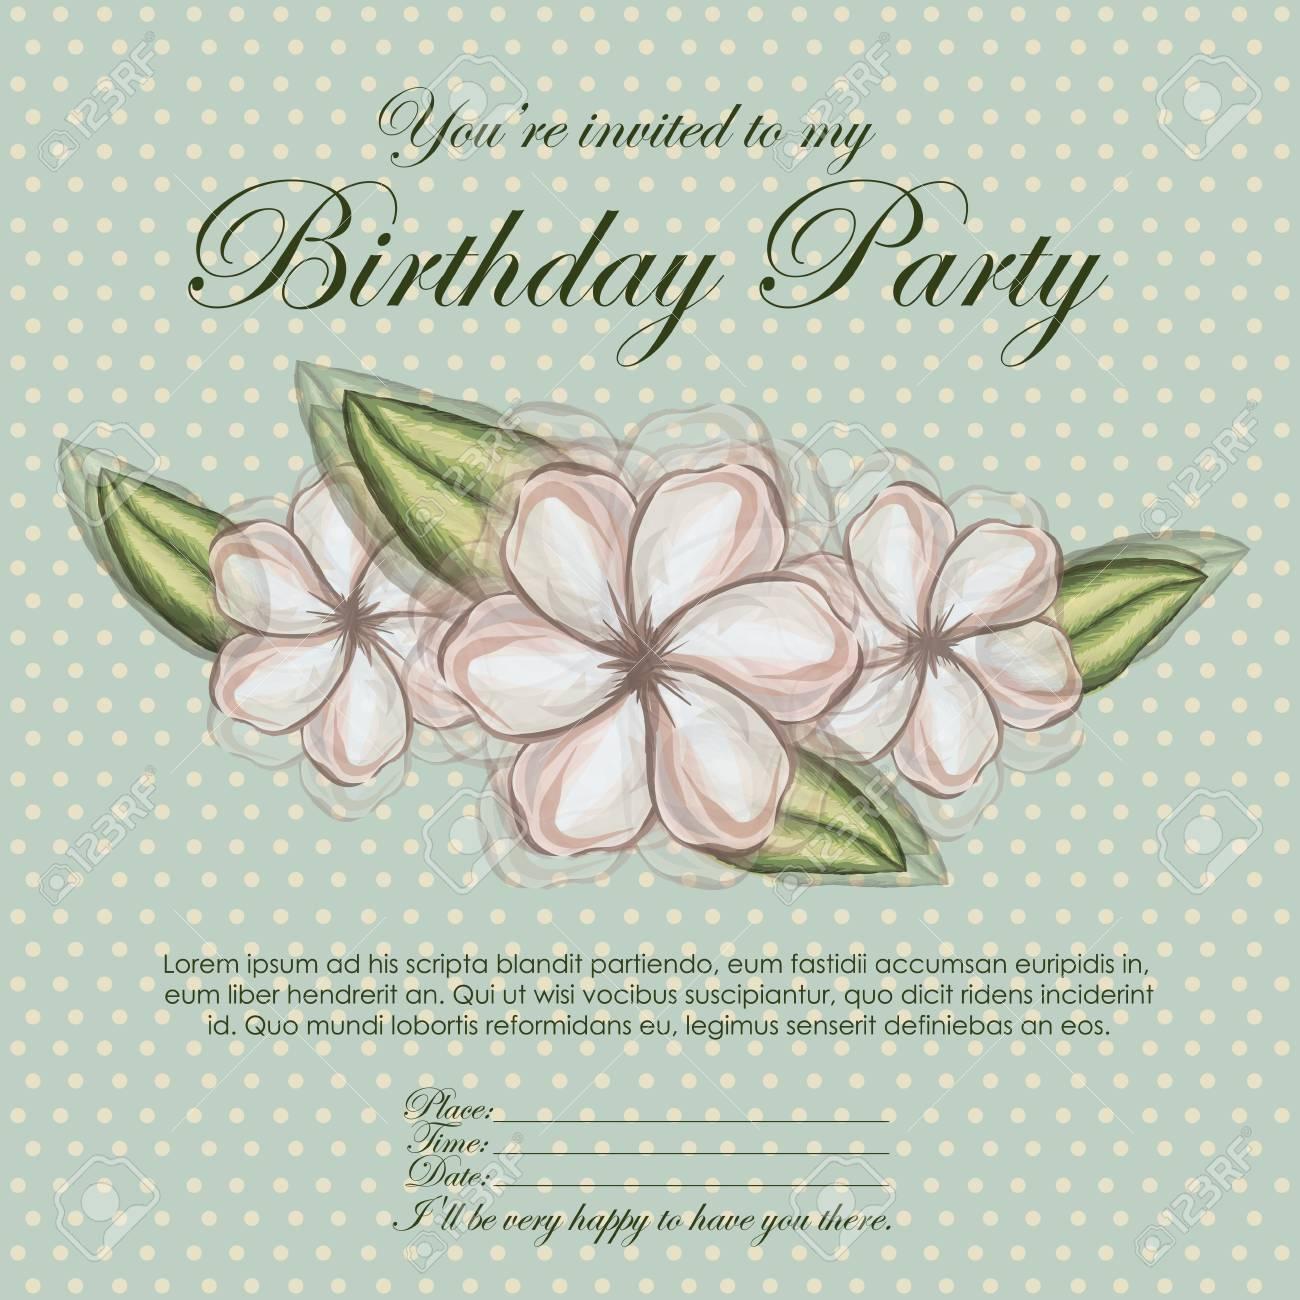 floral invitation birthday over blue background illustration Stock Vector - 19918444